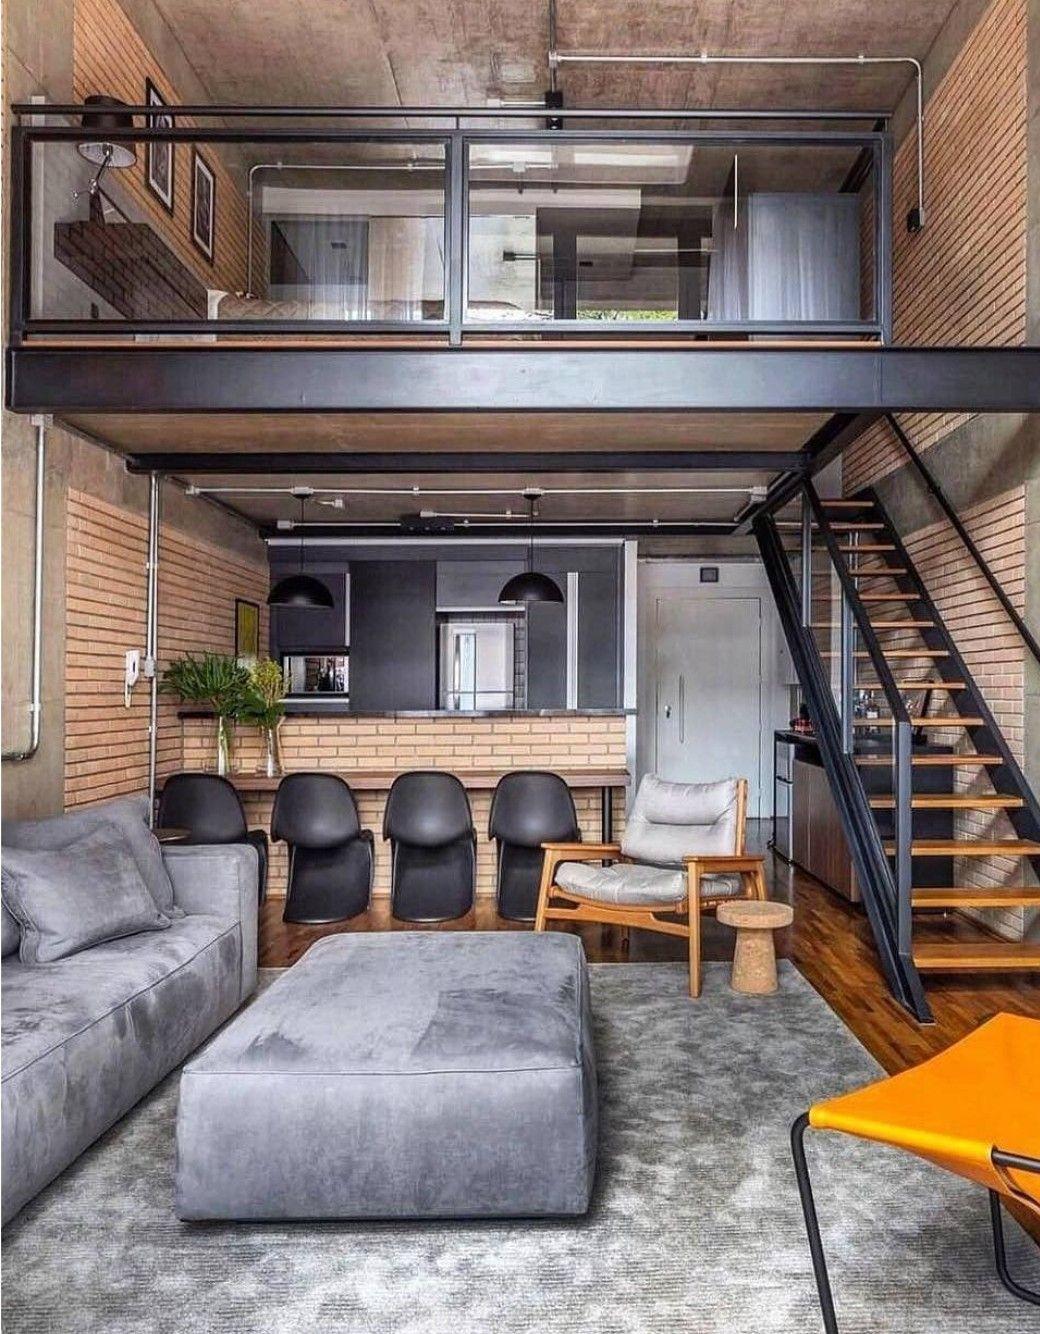 Loft studio Loft interior design, House design, Home